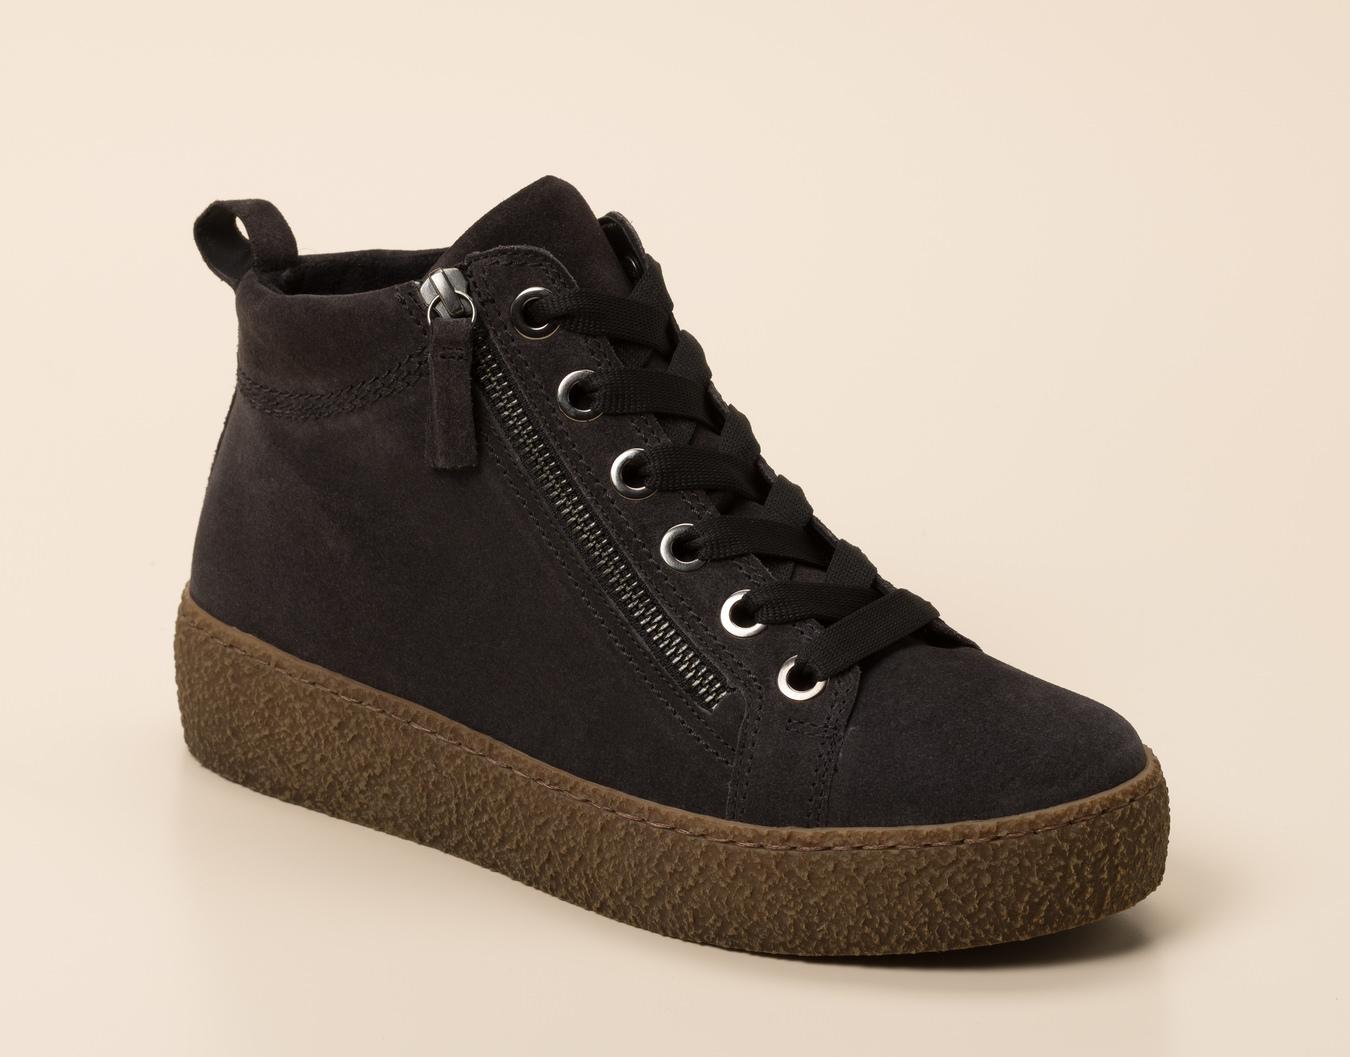 Gabor Shoes Damen Gabor Comfort Stiefel & Stiefeletten